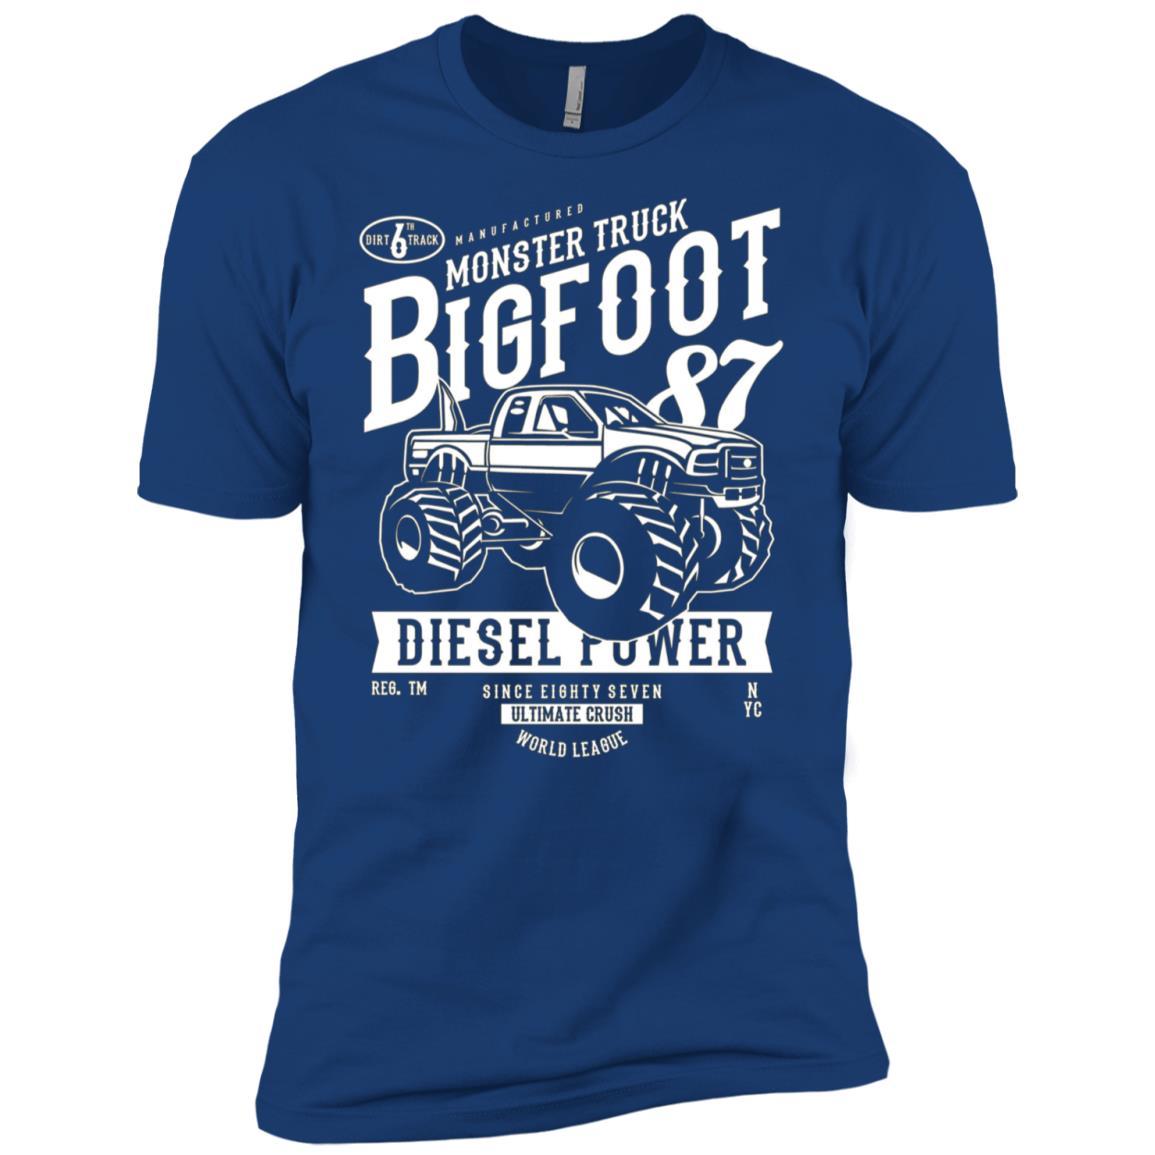 Monster truck Bigfoot Vintage Graphic Design Men Short Sleeve T-Shirt